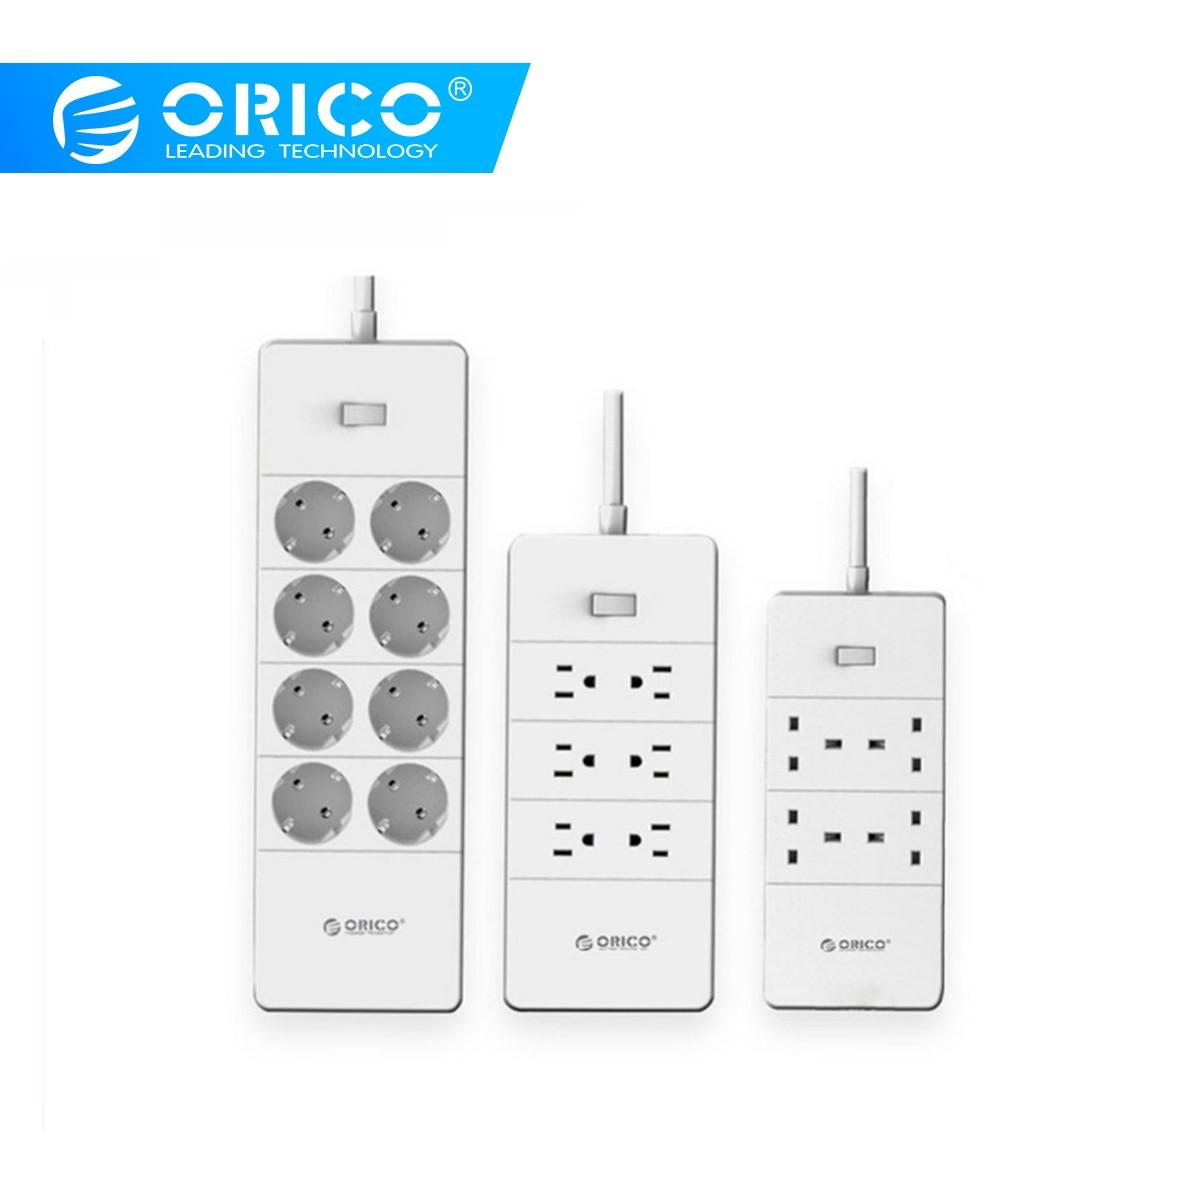 ORICO Power Streifen Surge Protector 5 USB Ports EU UK UNS Steckdose 4 6 8 AC Outlets Multifunktionale Smart home Elektronik auf   1